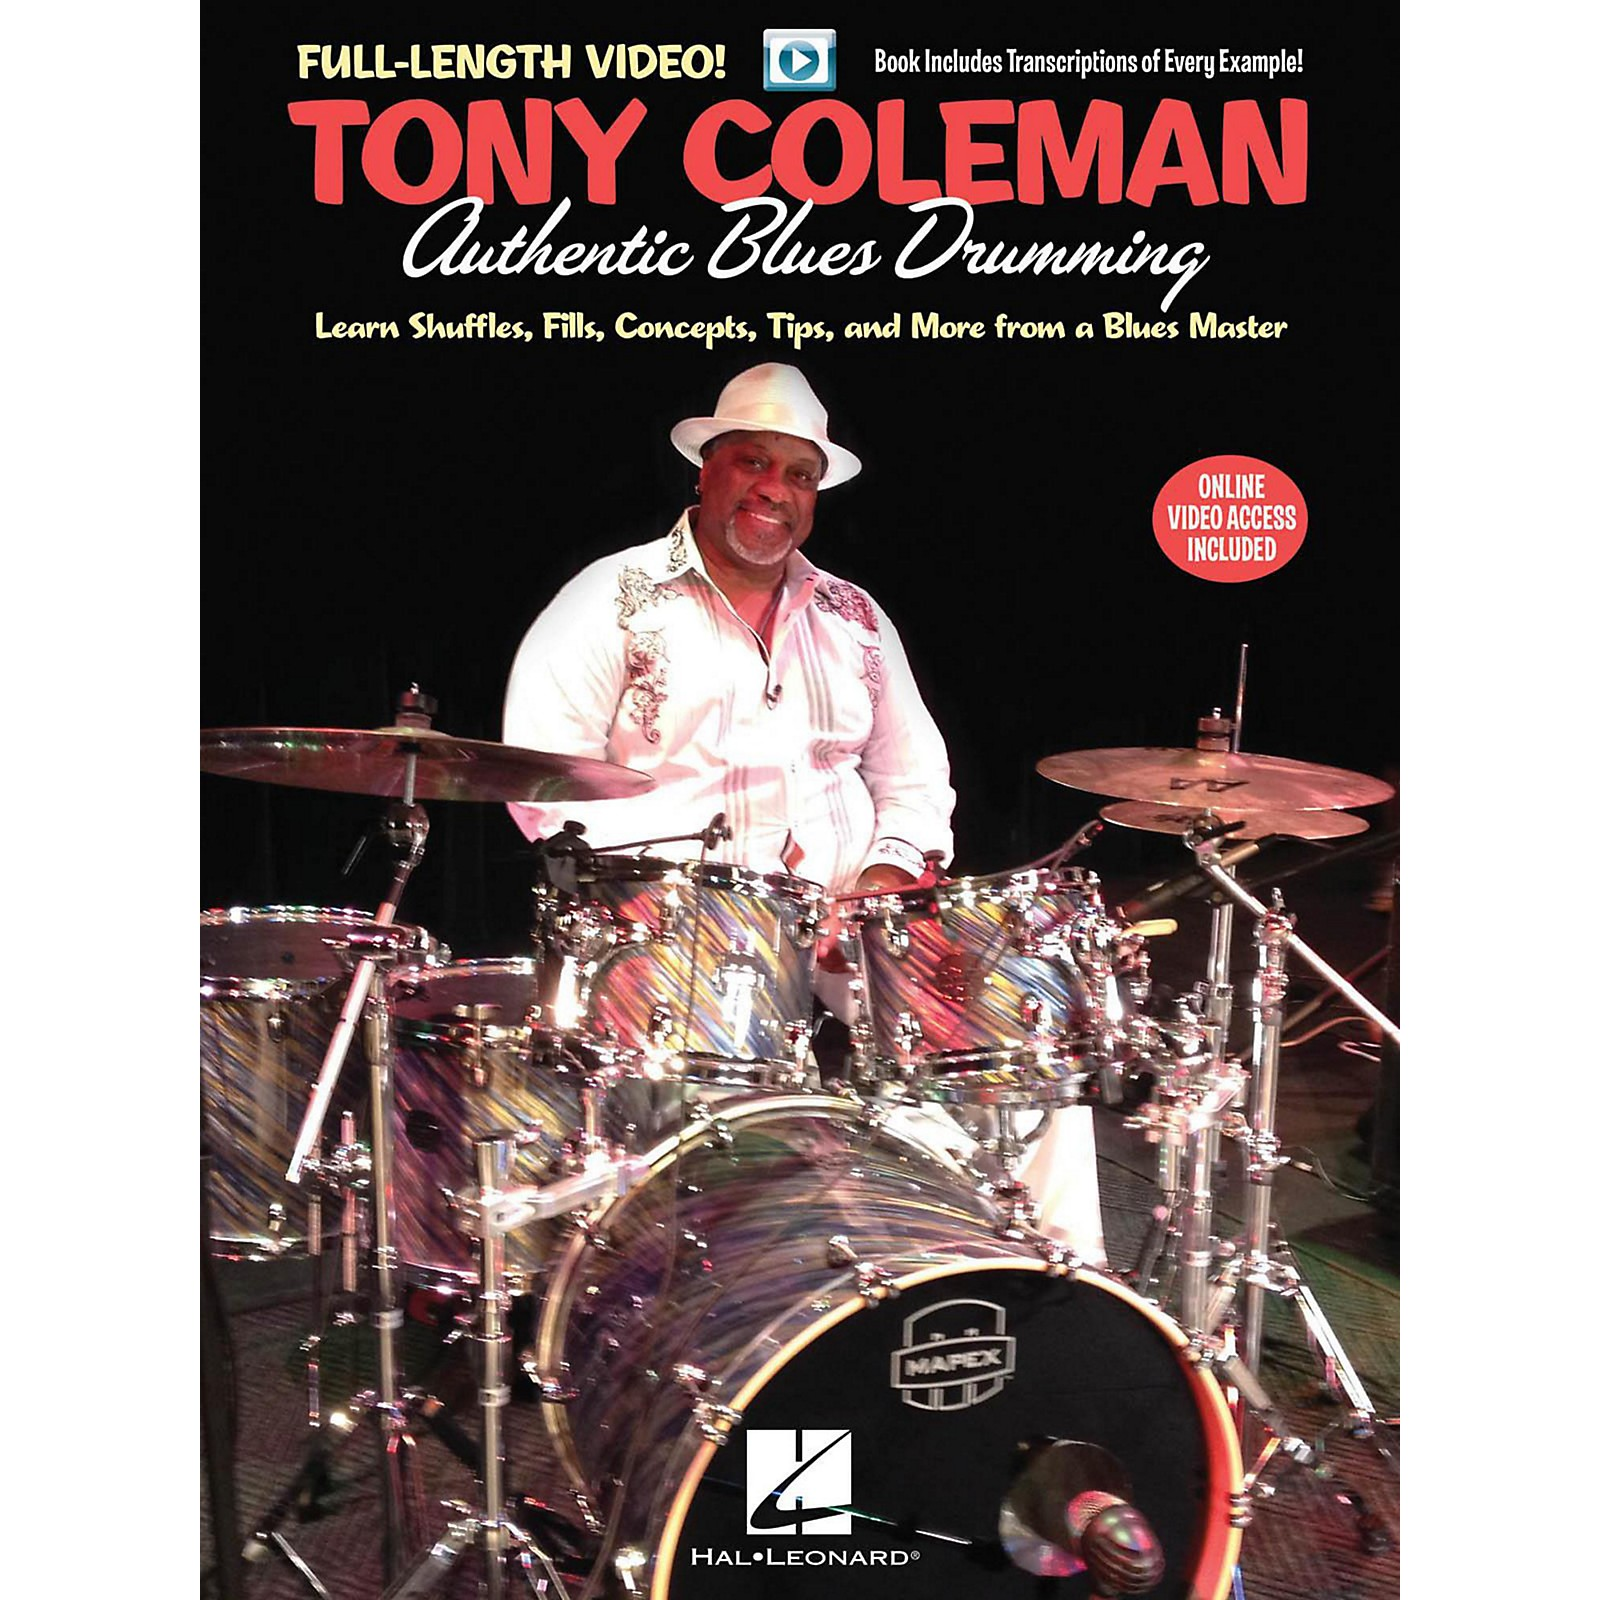 Hal Leonard Tony Coleman - Authentic Blues Drumming - Book/Online Video